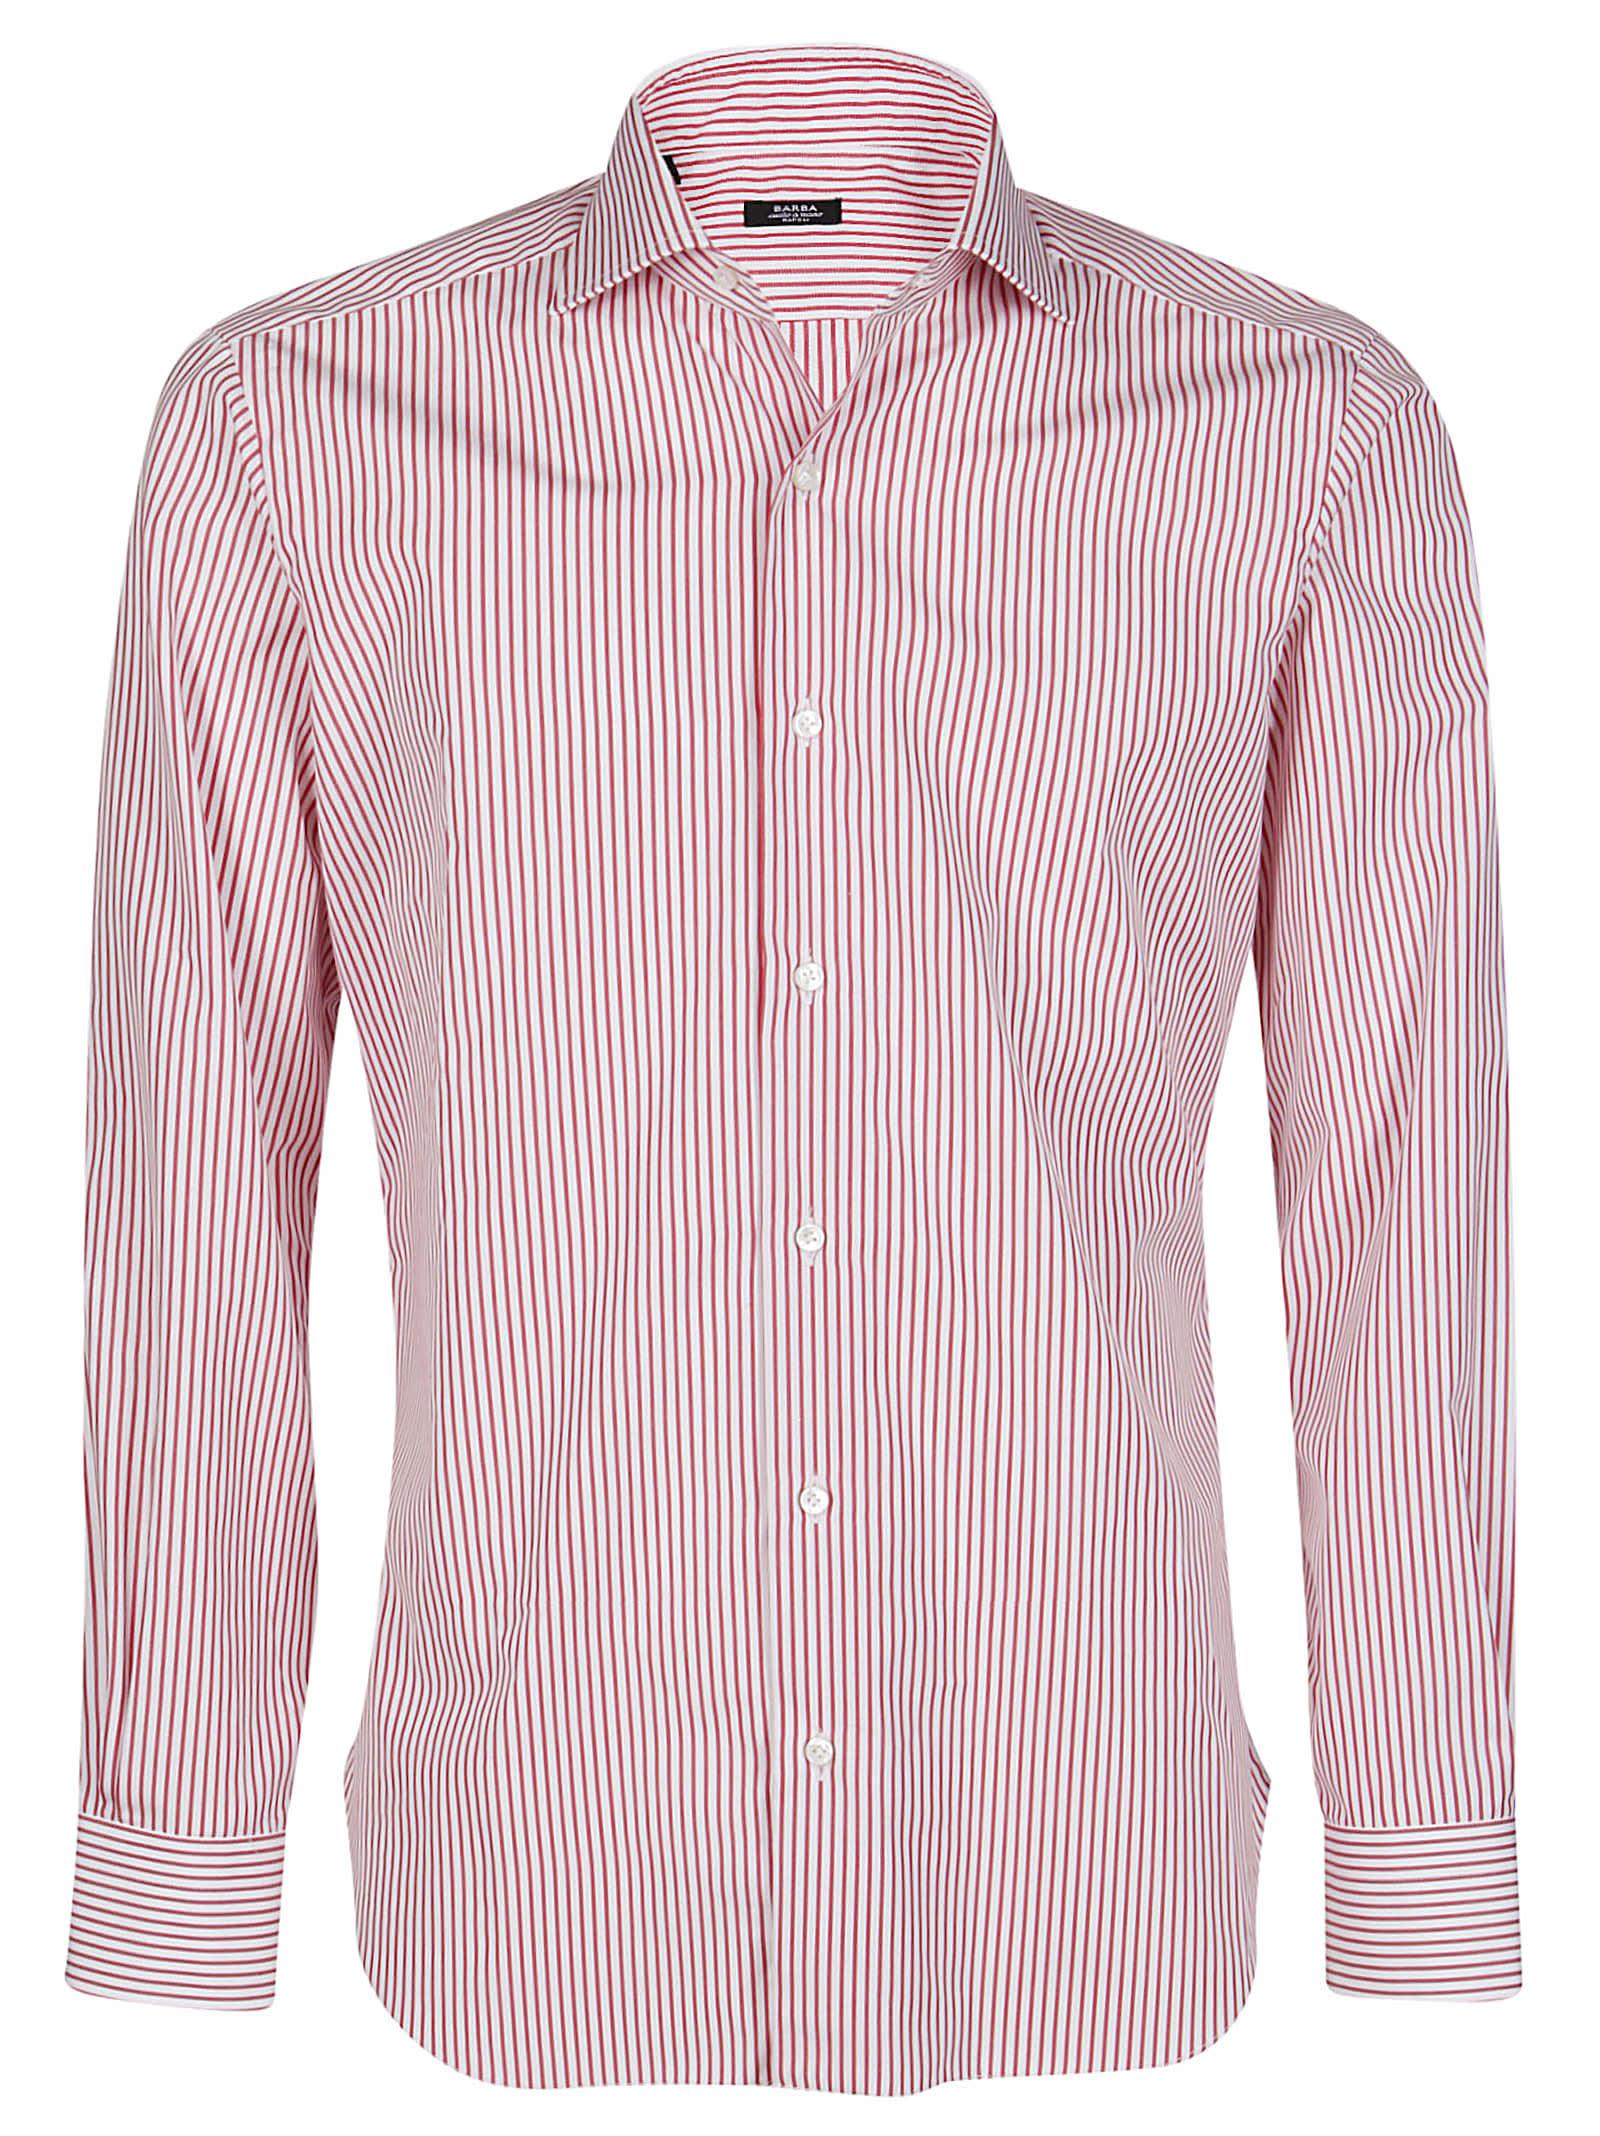 Barba Napoli Red And White Cotton Shirt